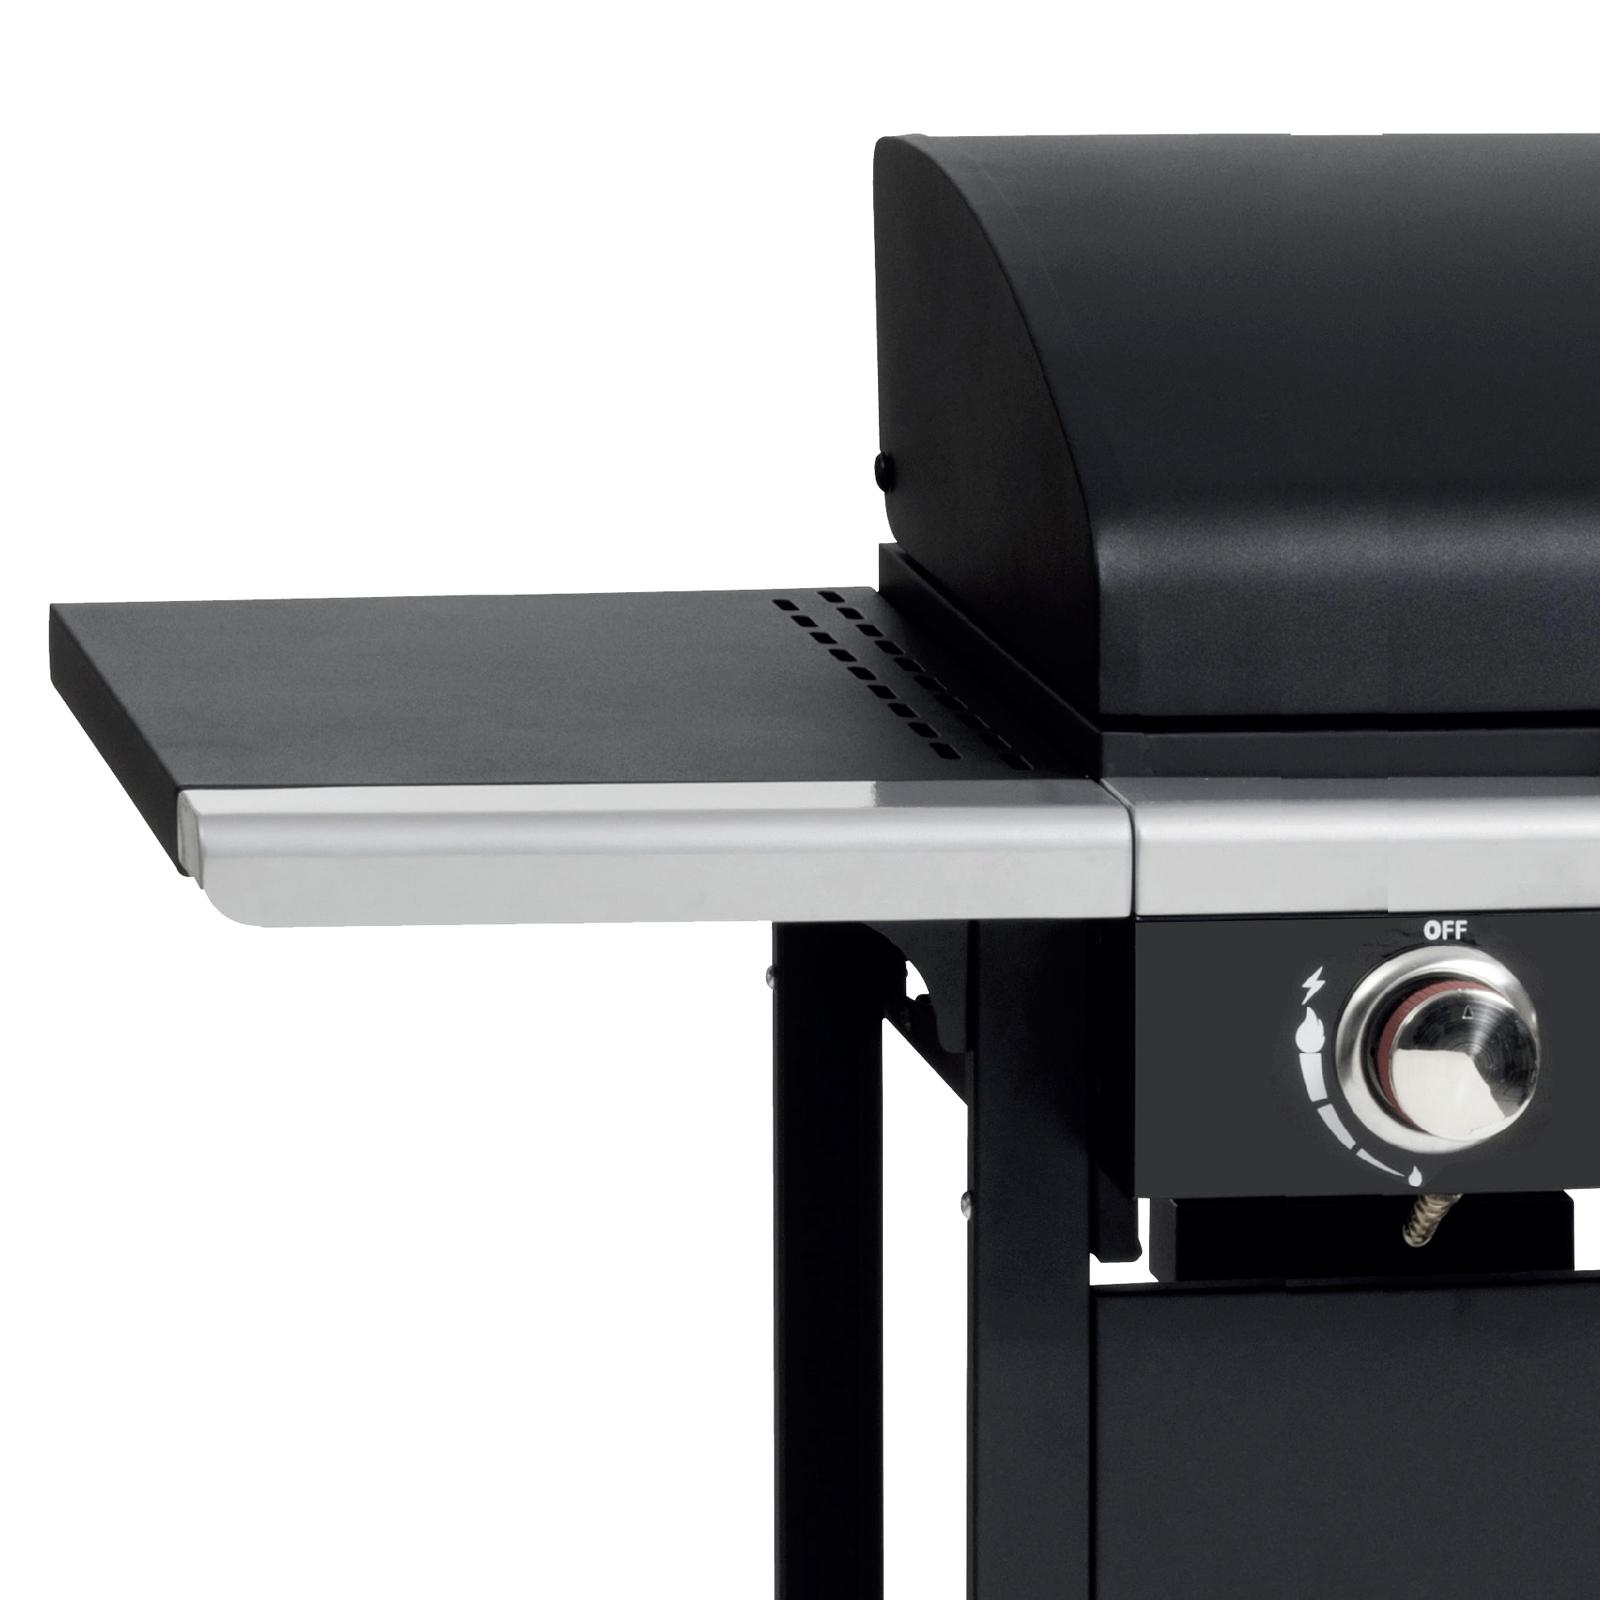 gartengrill standgrill gas gasgrill grill grillwagen bbq grillstation smoker ebay. Black Bedroom Furniture Sets. Home Design Ideas